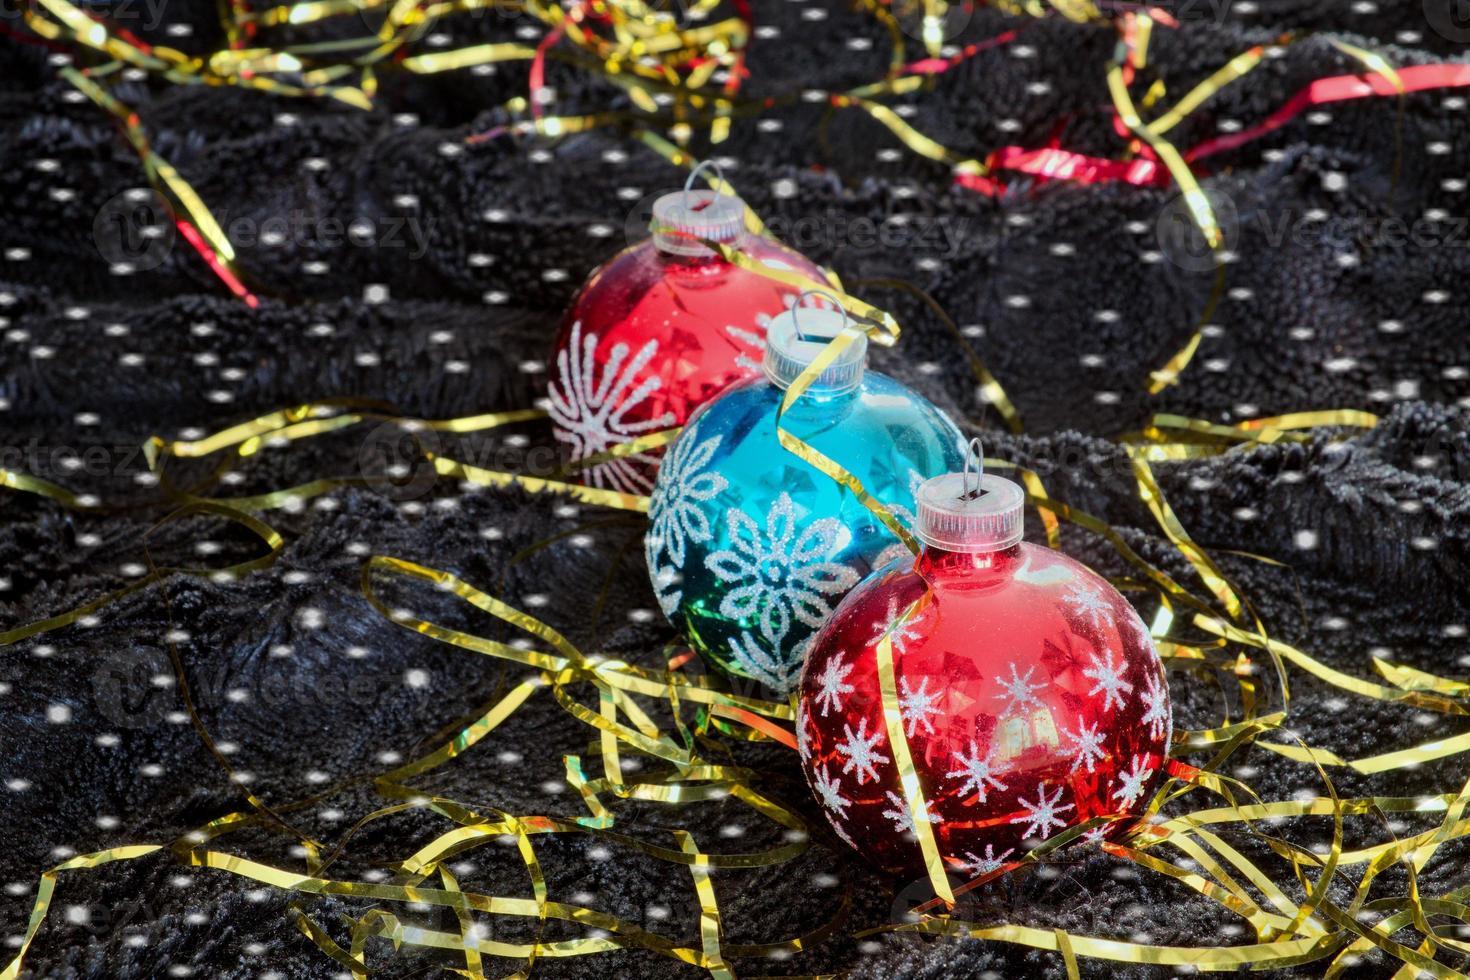 Decoración navideña con copos de nieve sobre terciopelo negro foto